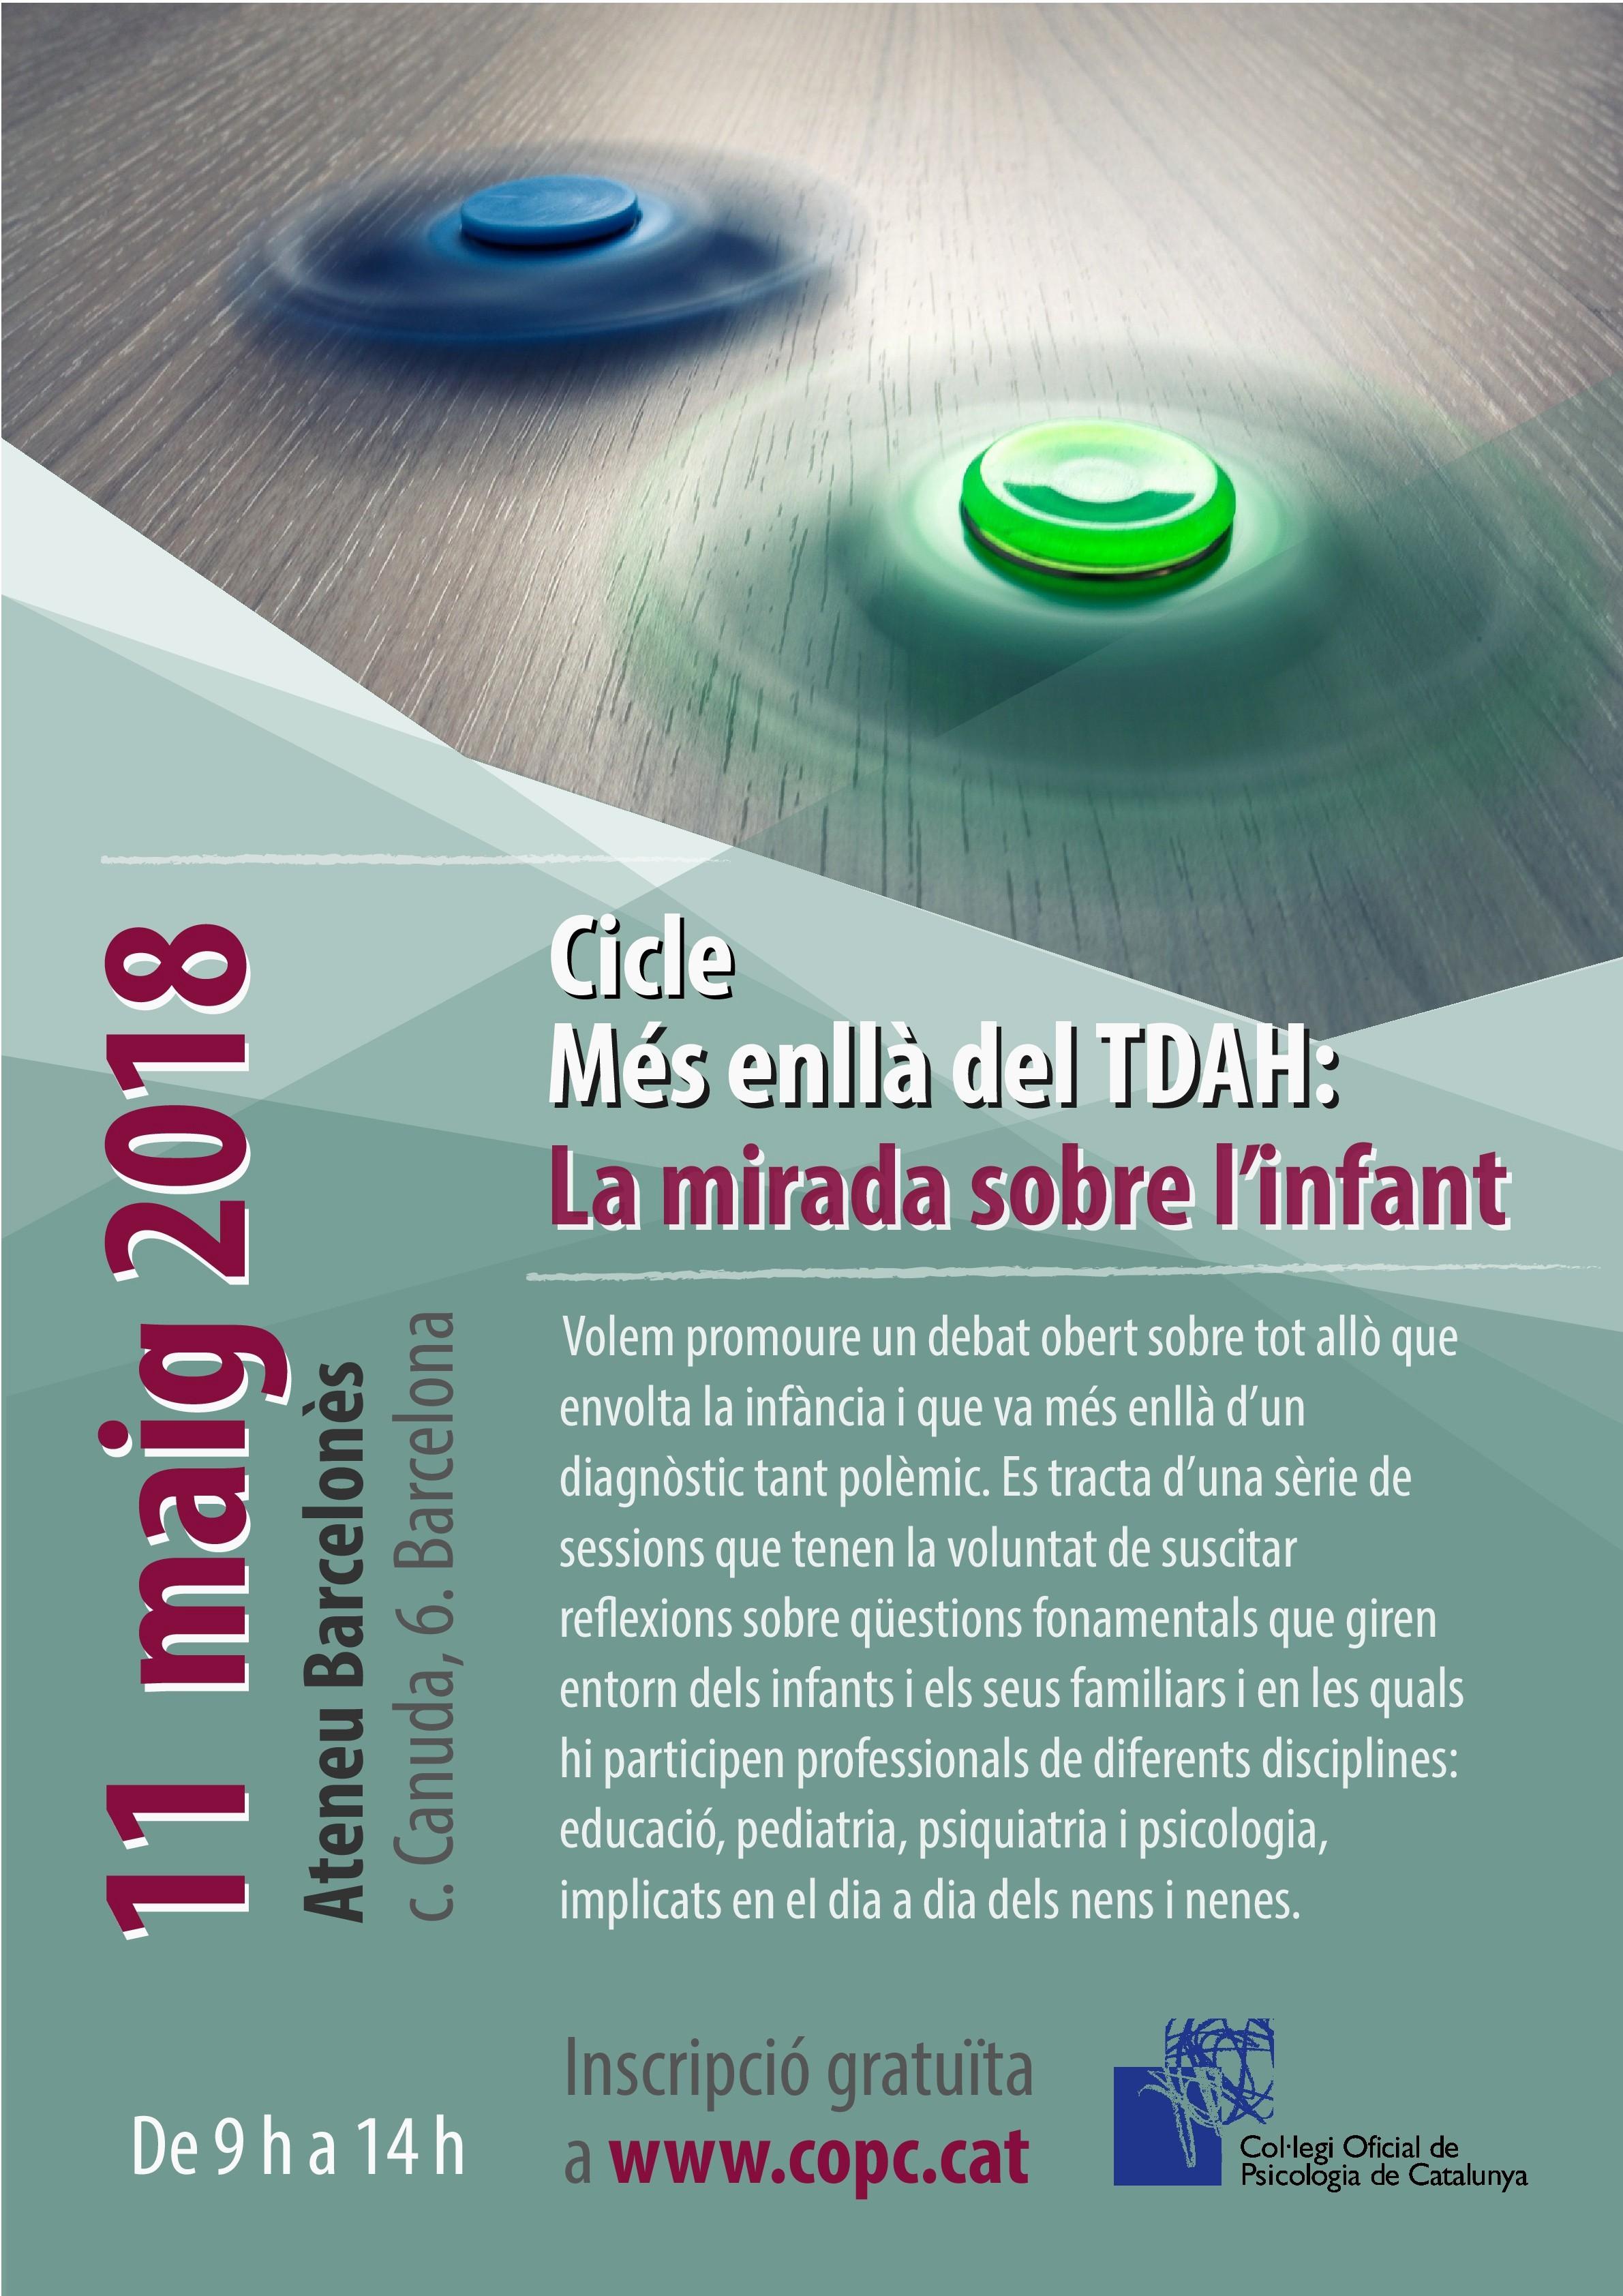 Psicologia Ub Calendari 2019 Psicologia Universitat De Barcelona